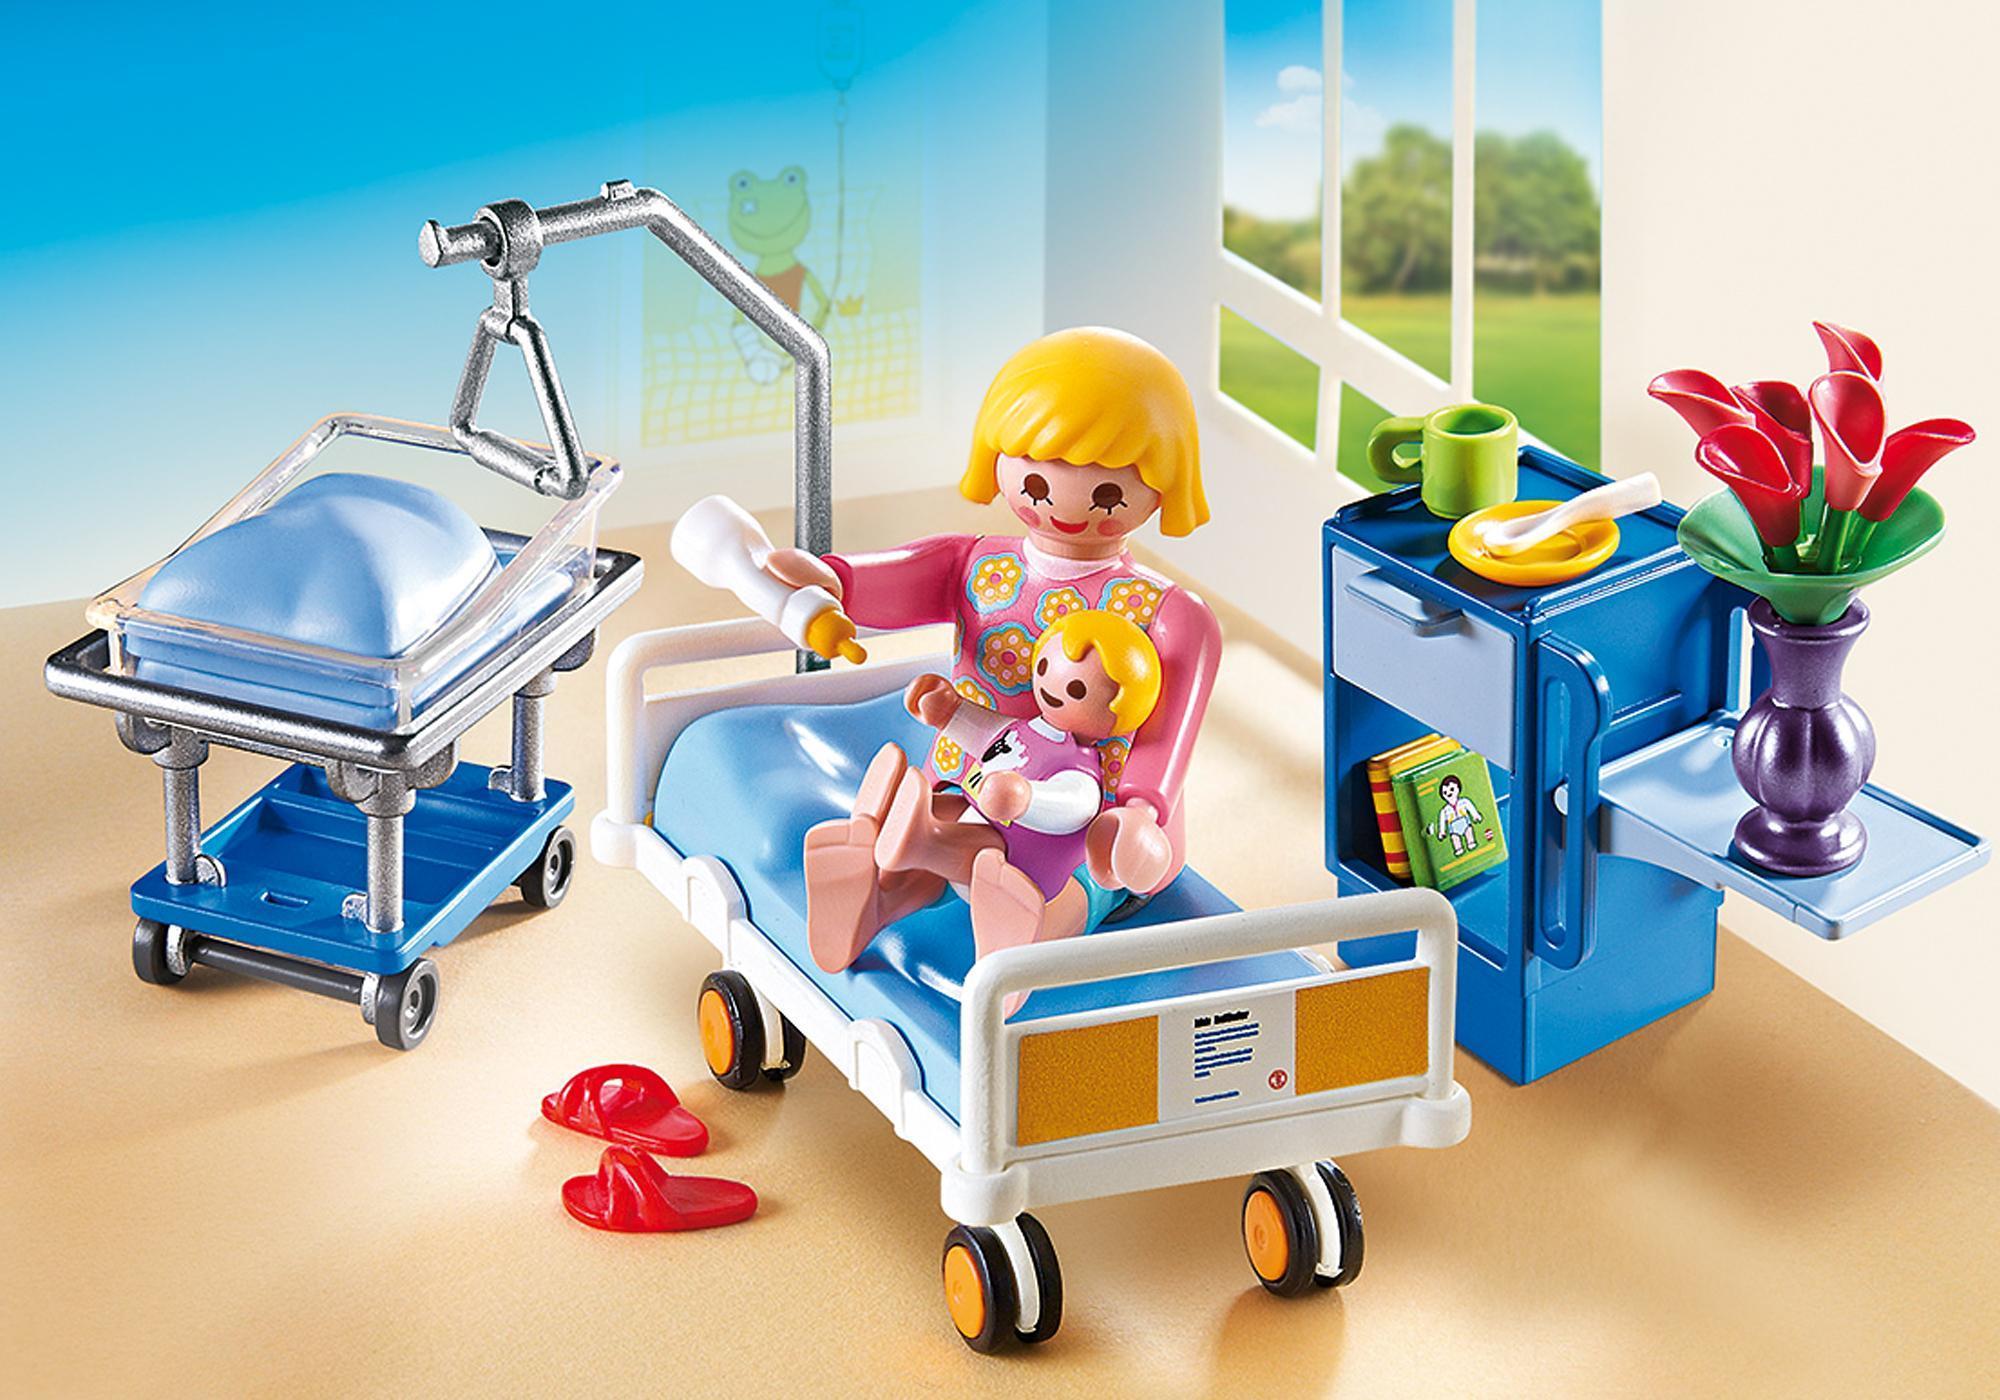 http://media.playmobil.com/i/playmobil/6660_product_detail/Chambre de maternité